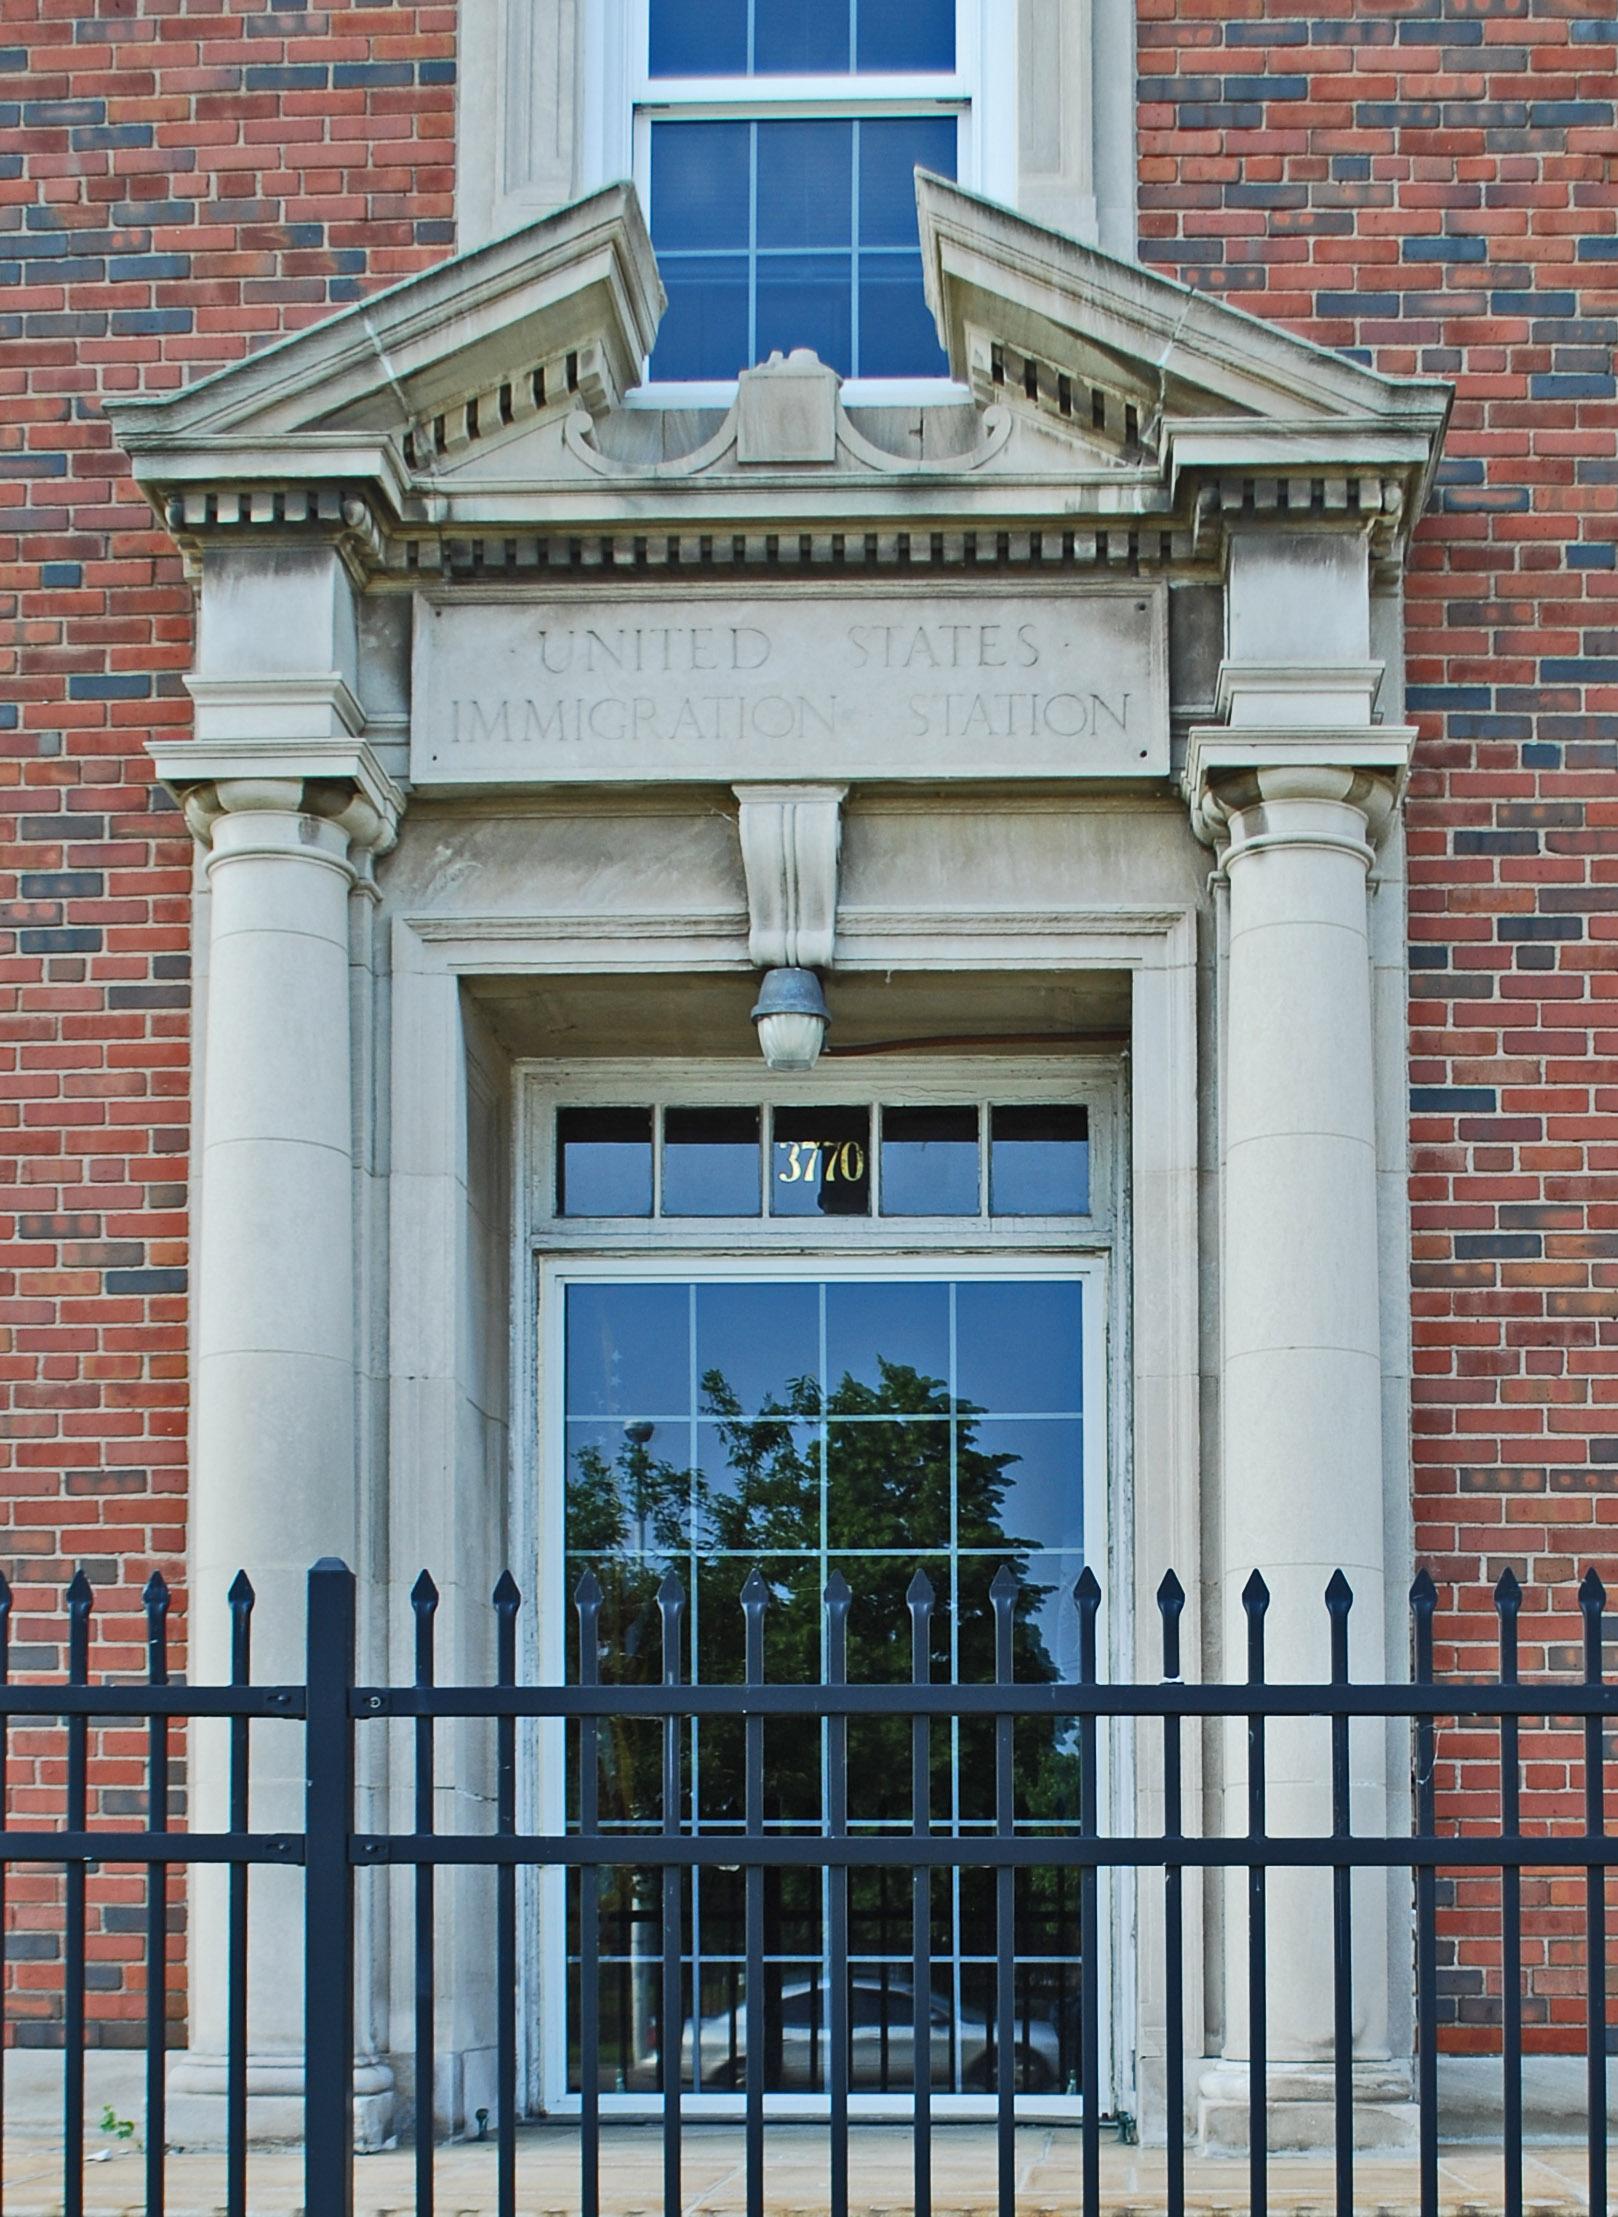 FileRosa Parks Federal Building Detroit Door.jpg & File:Rosa Parks Federal Building Detroit Door.jpg - Wikimedia Commons pezcame.com